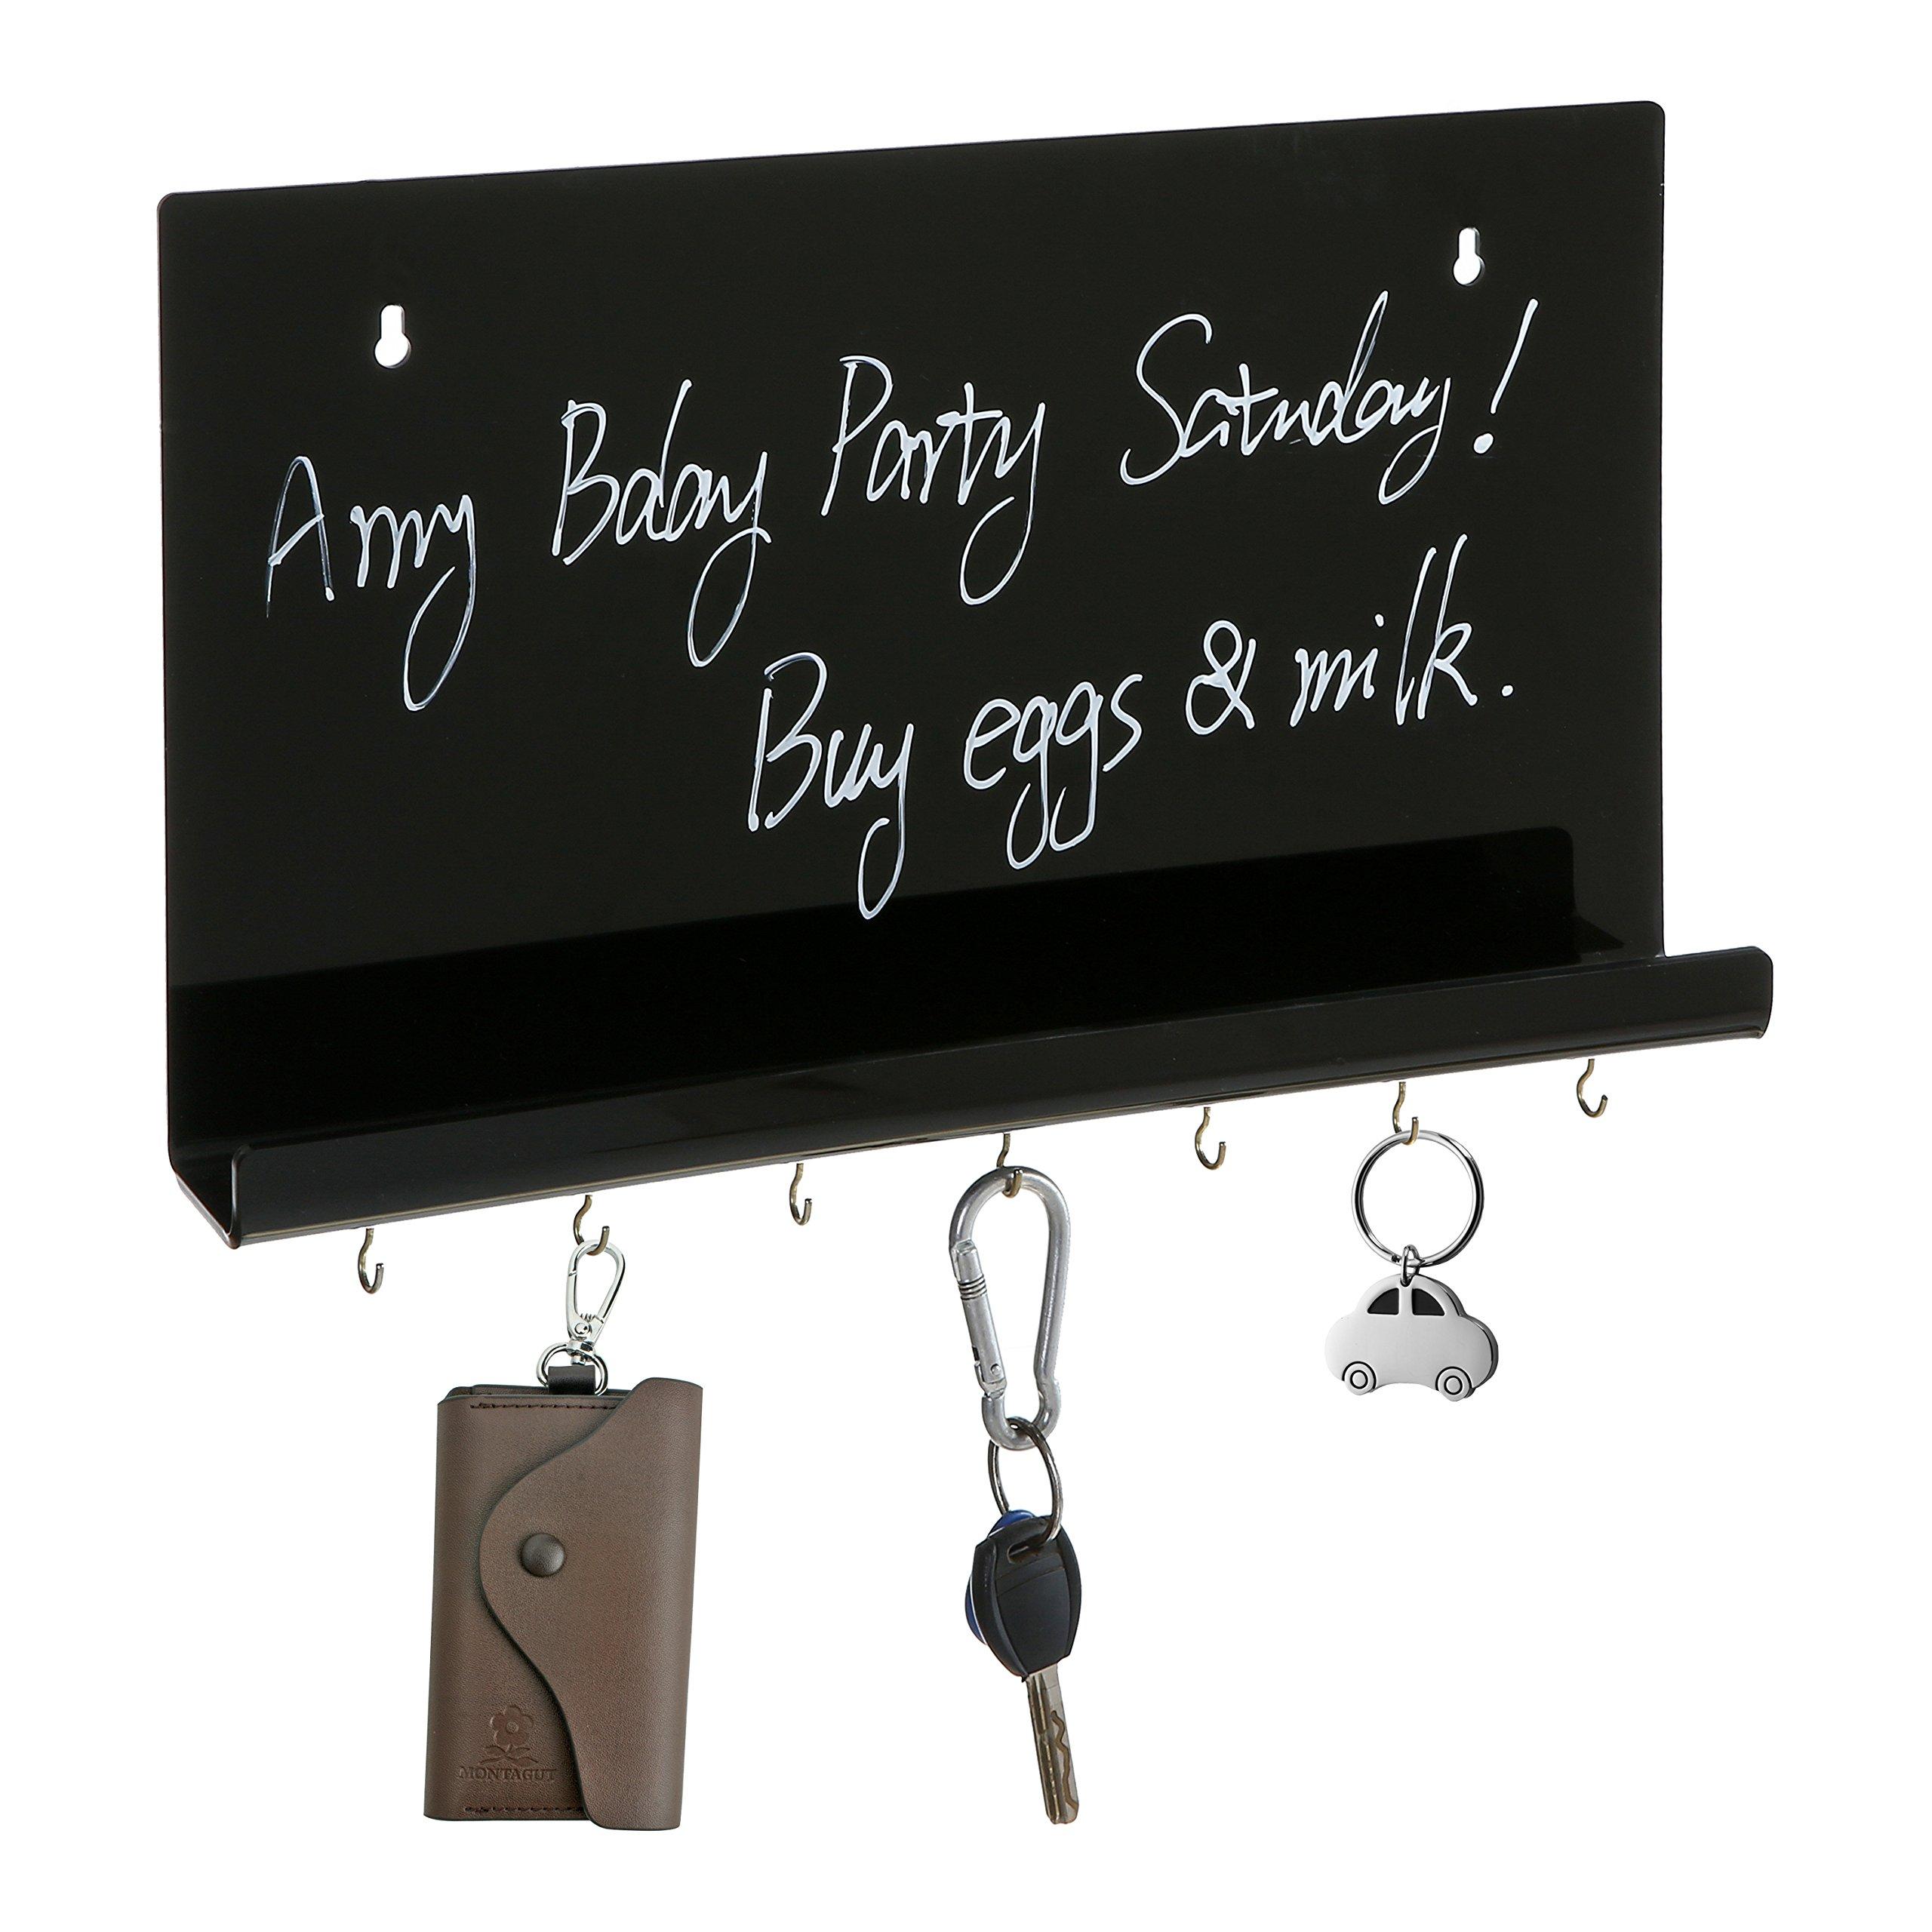 Wall Mounted Black Acrylic Liquid Chalk Message Board w/ Mail Holder Ledge and Metal Key Hooks Organizer